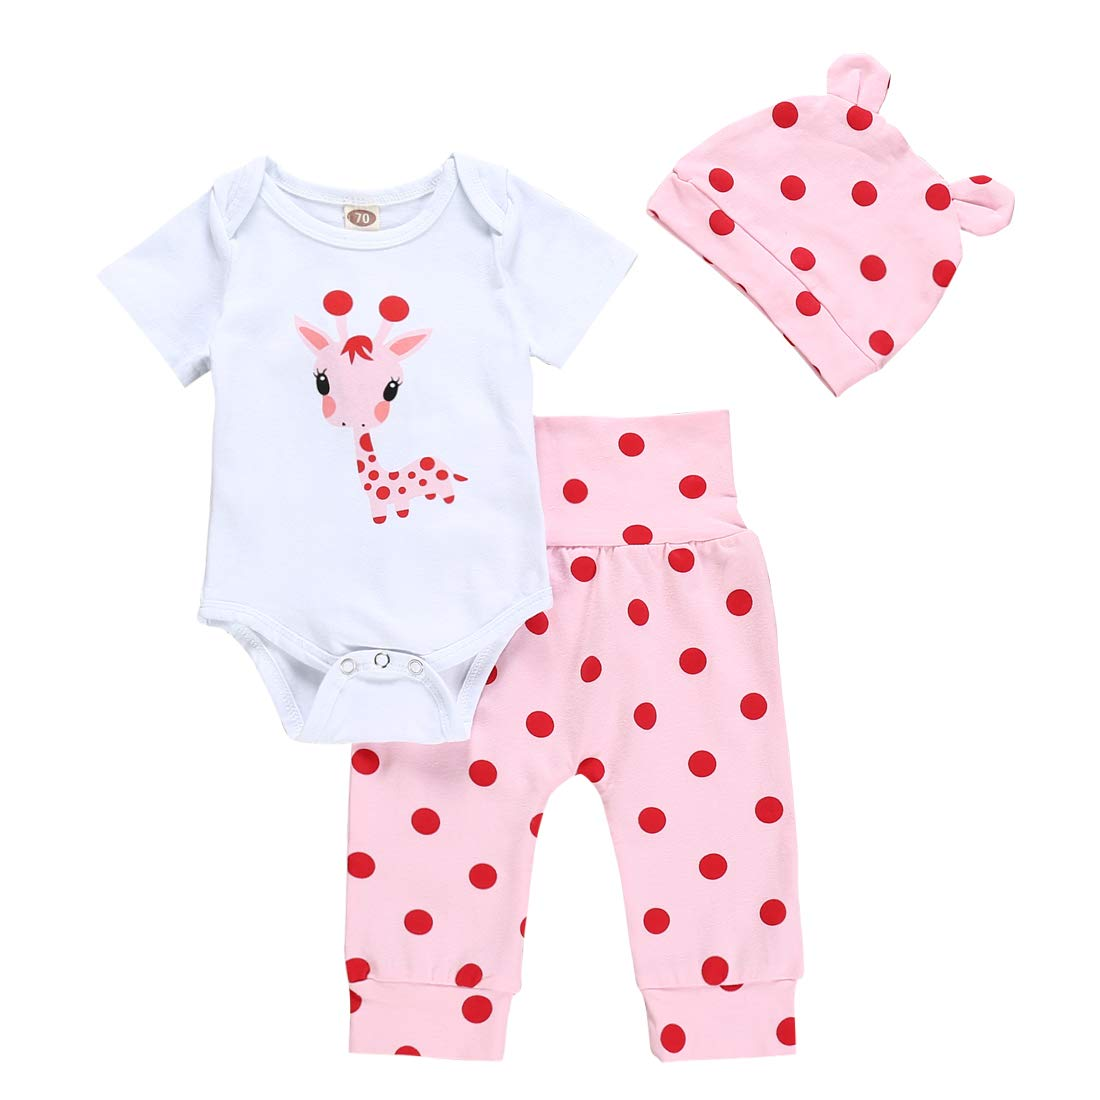 Giraffe baby outfit and hat leggings Pink Giraffe giraffe bodysuit